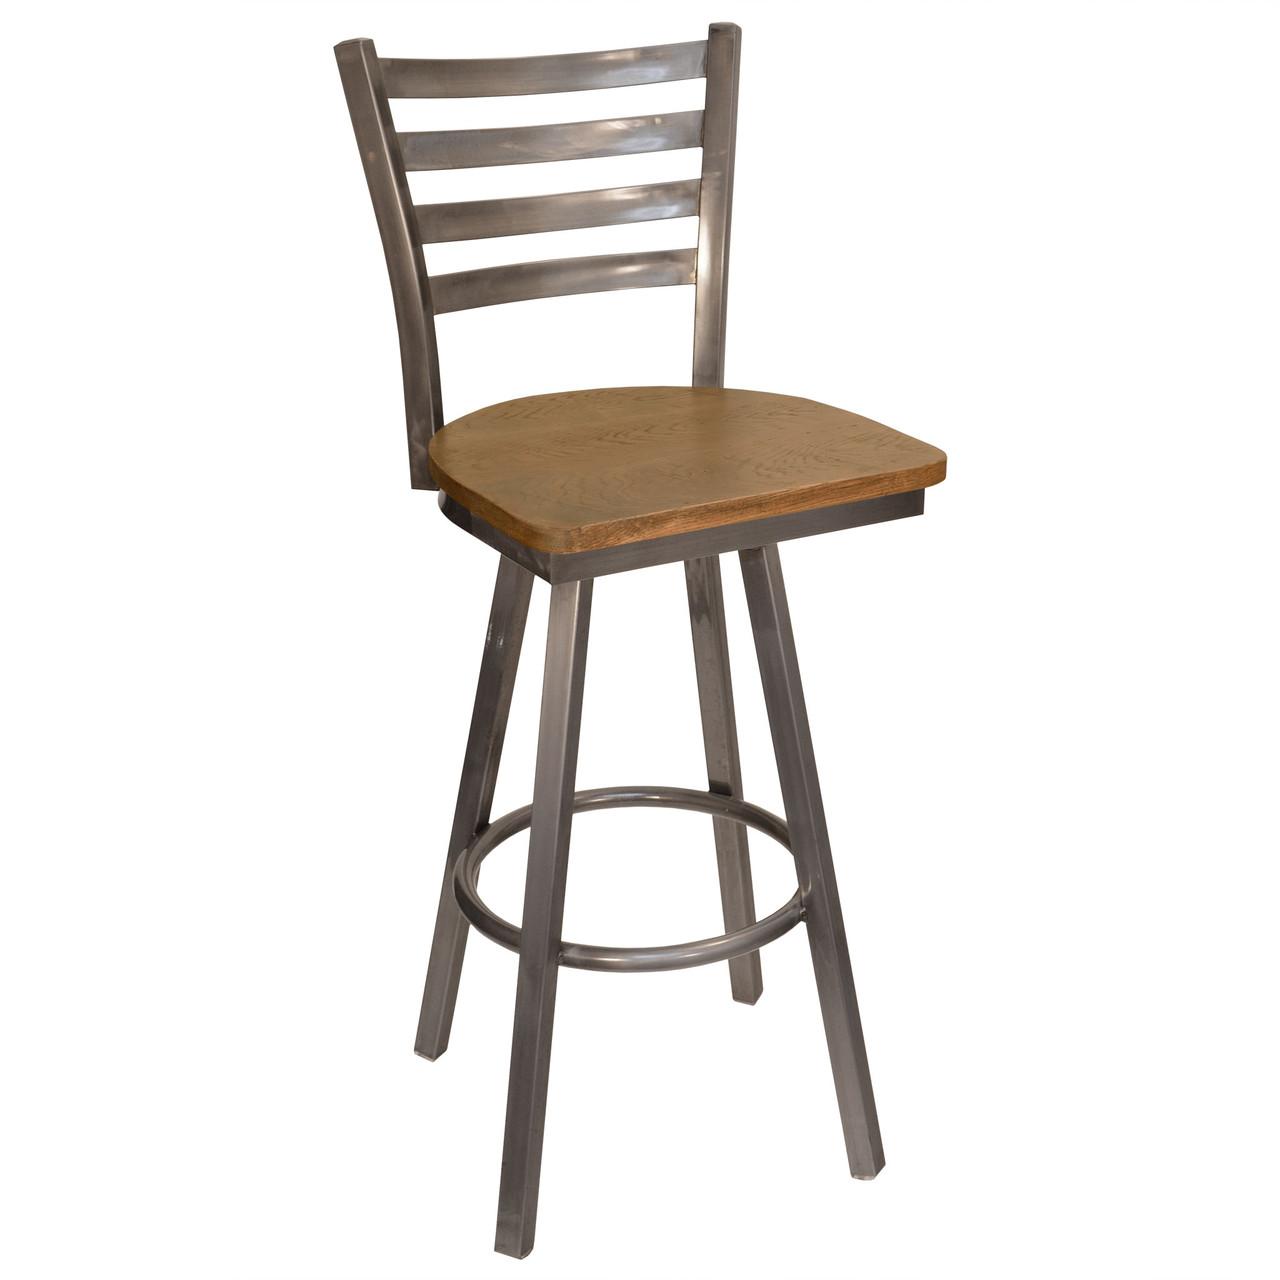 Gladiator 101sbs Clear Coat Swivel Metal Bar Stool W Rustic Wood Seat